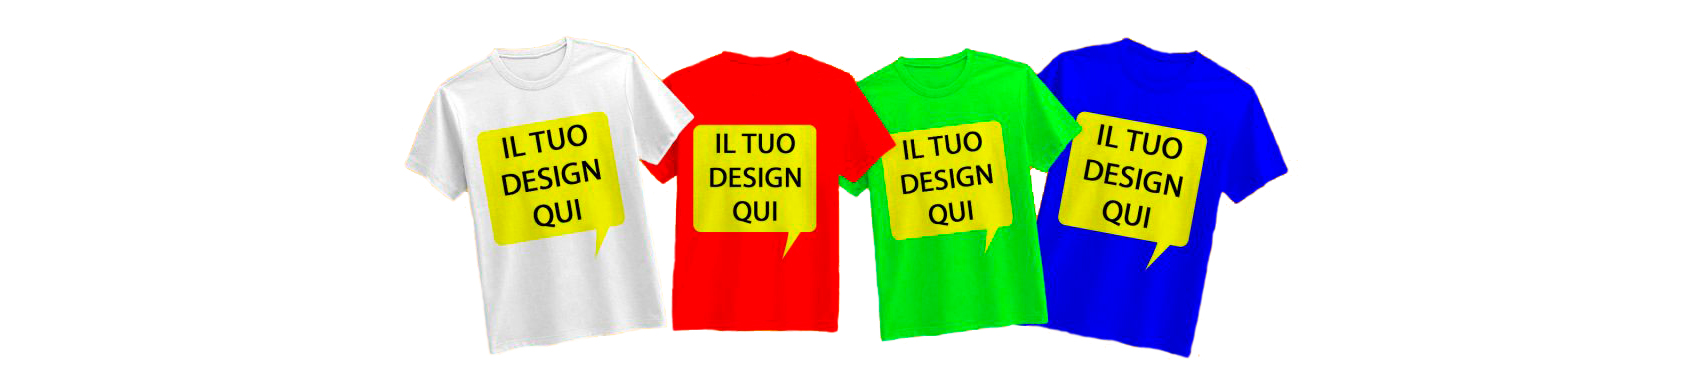 Slide-t-shirt-2-PRIMA